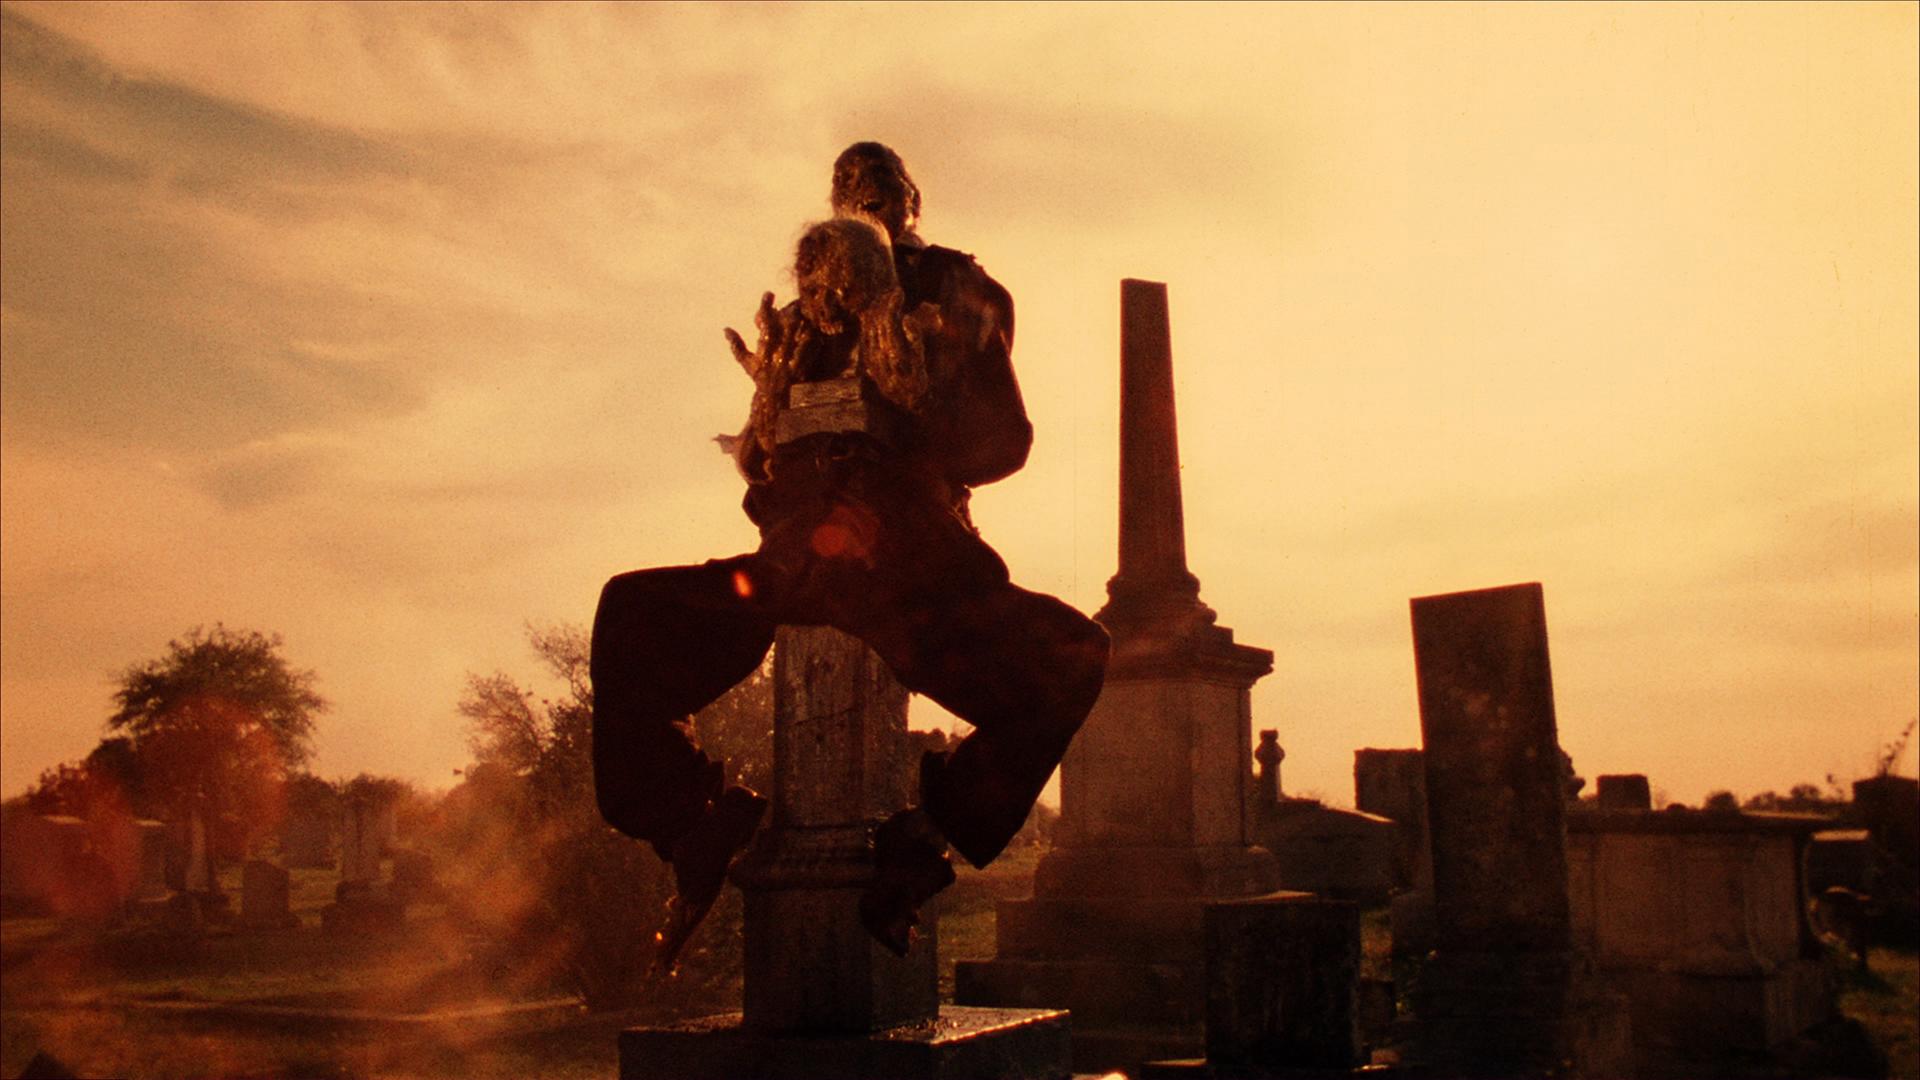 The Texas Chainsaw Massacre - 13.jpg